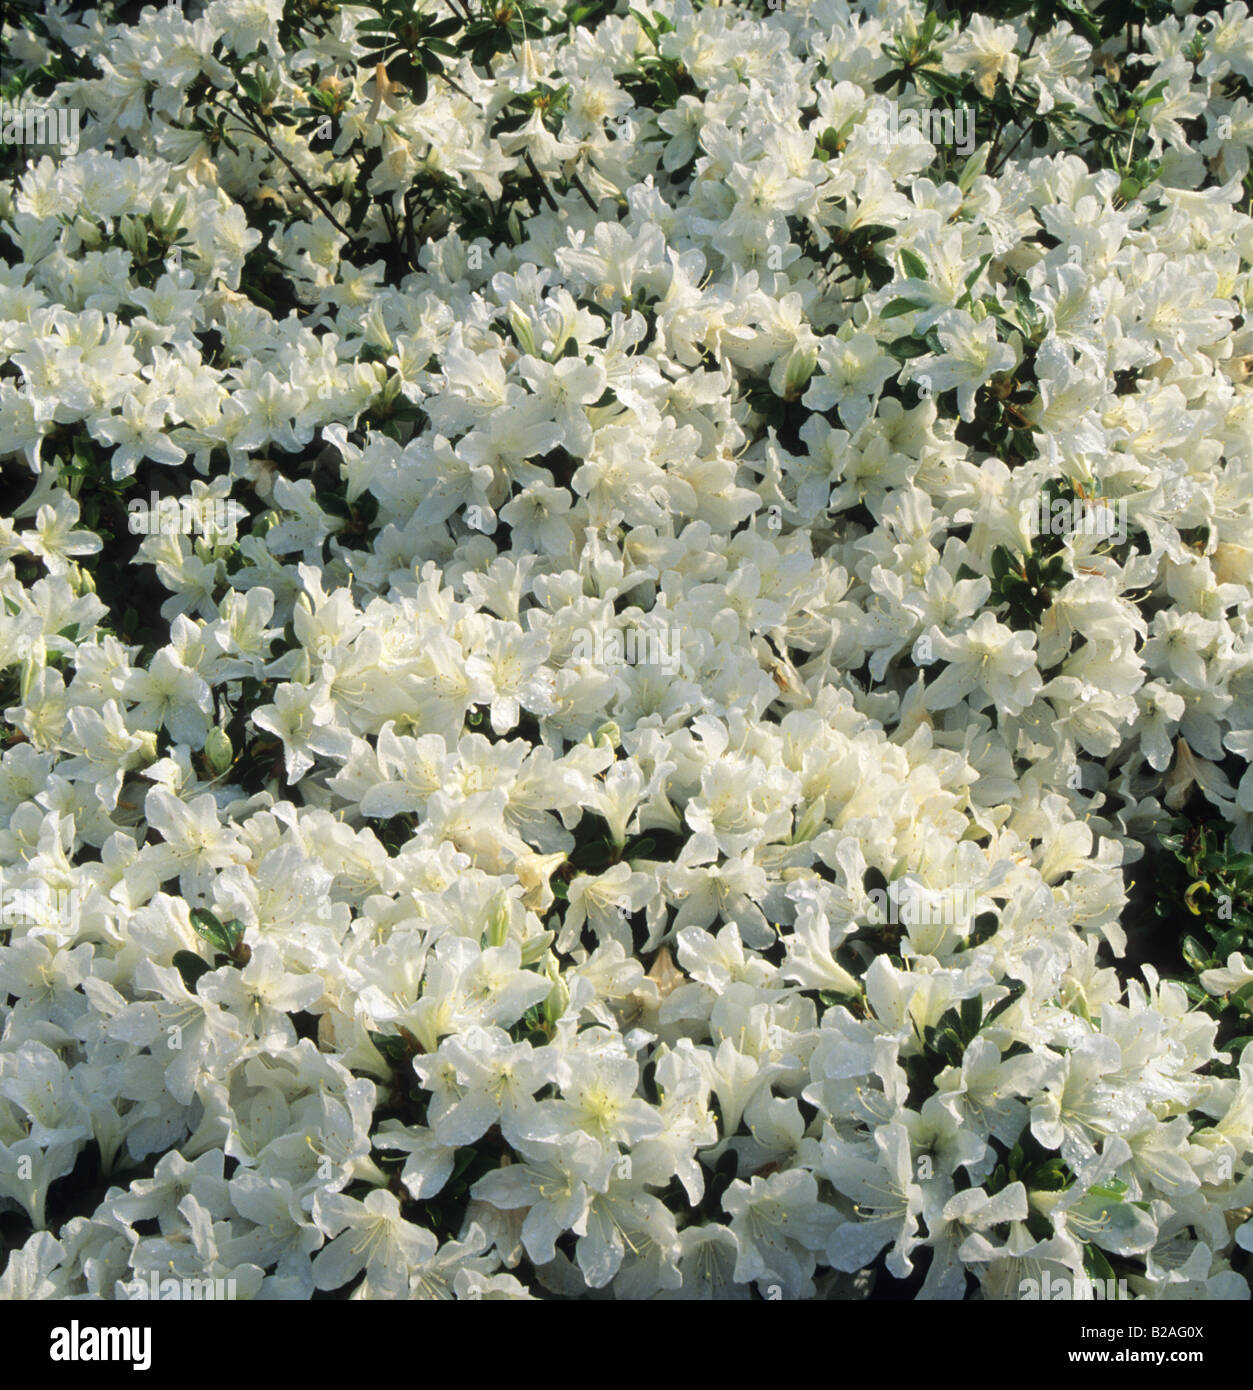 azalea Rhododendron Driven Snow - Stock Image